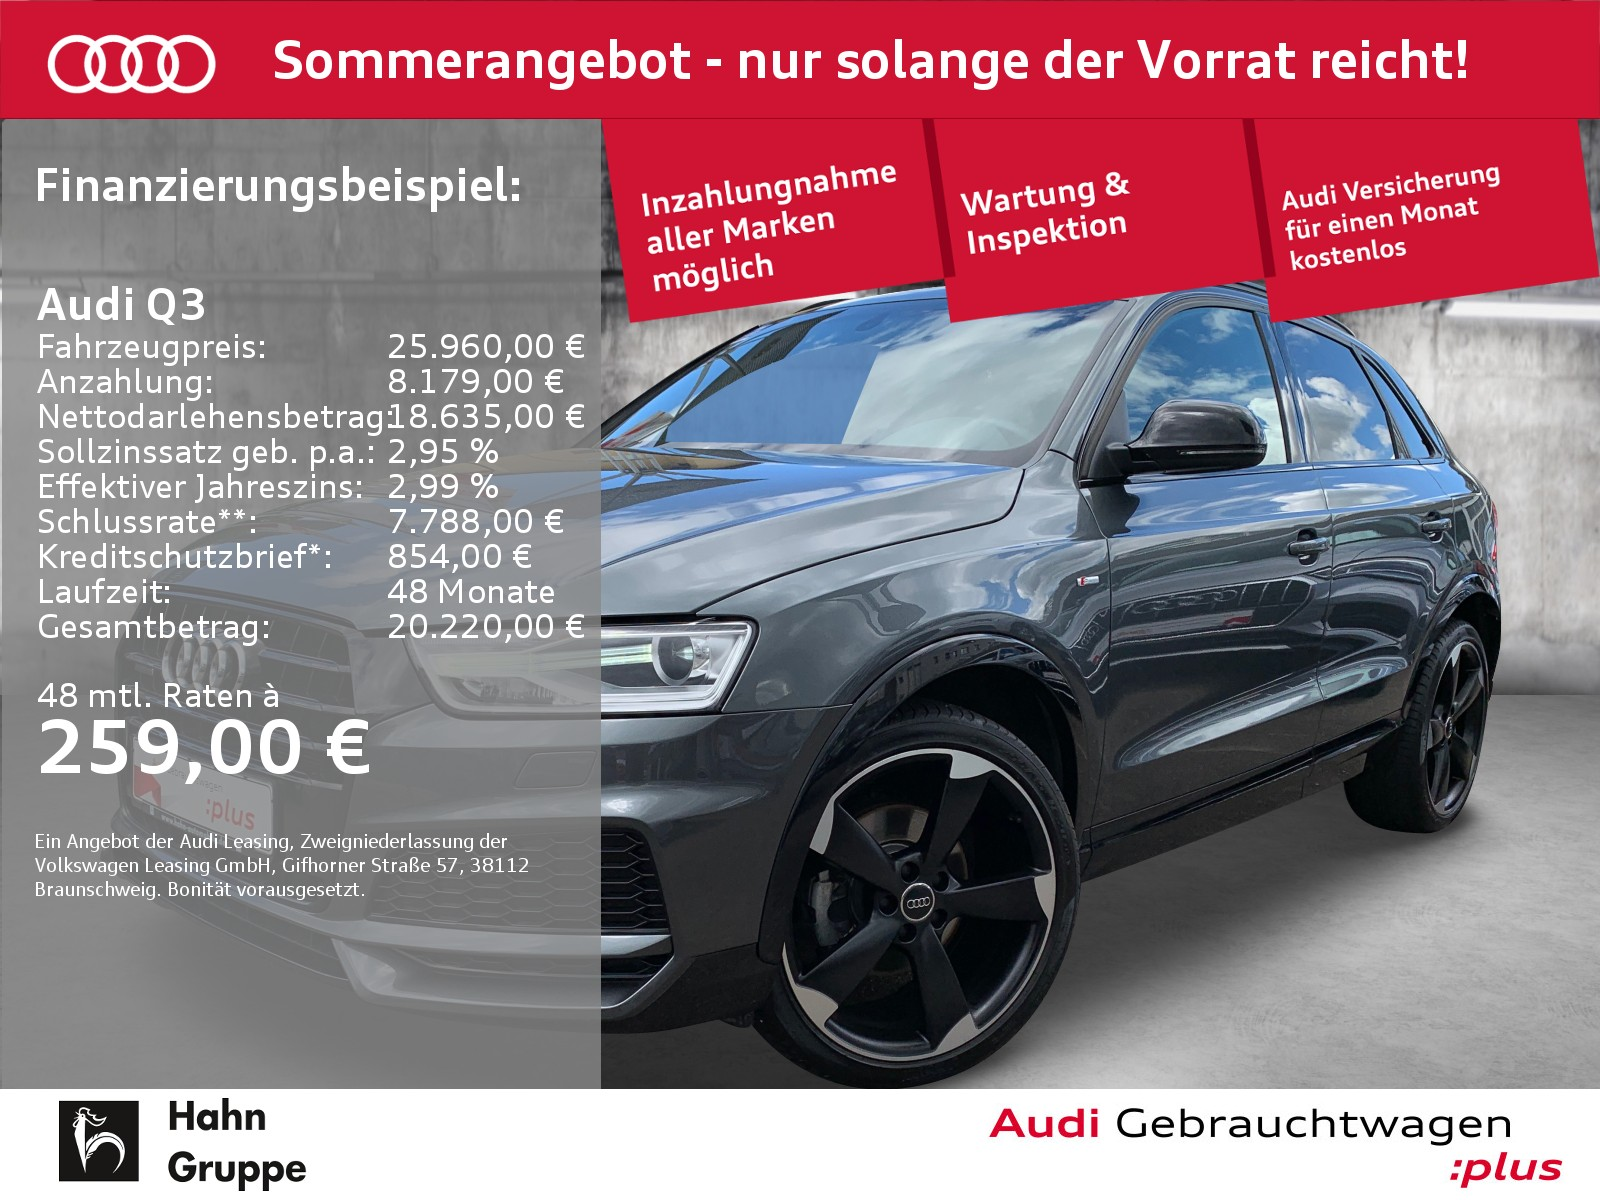 Audi Q3 2.0 TDI qua. S-line Navi Xen Sitzh Einpark, Jahr 2018, Diesel